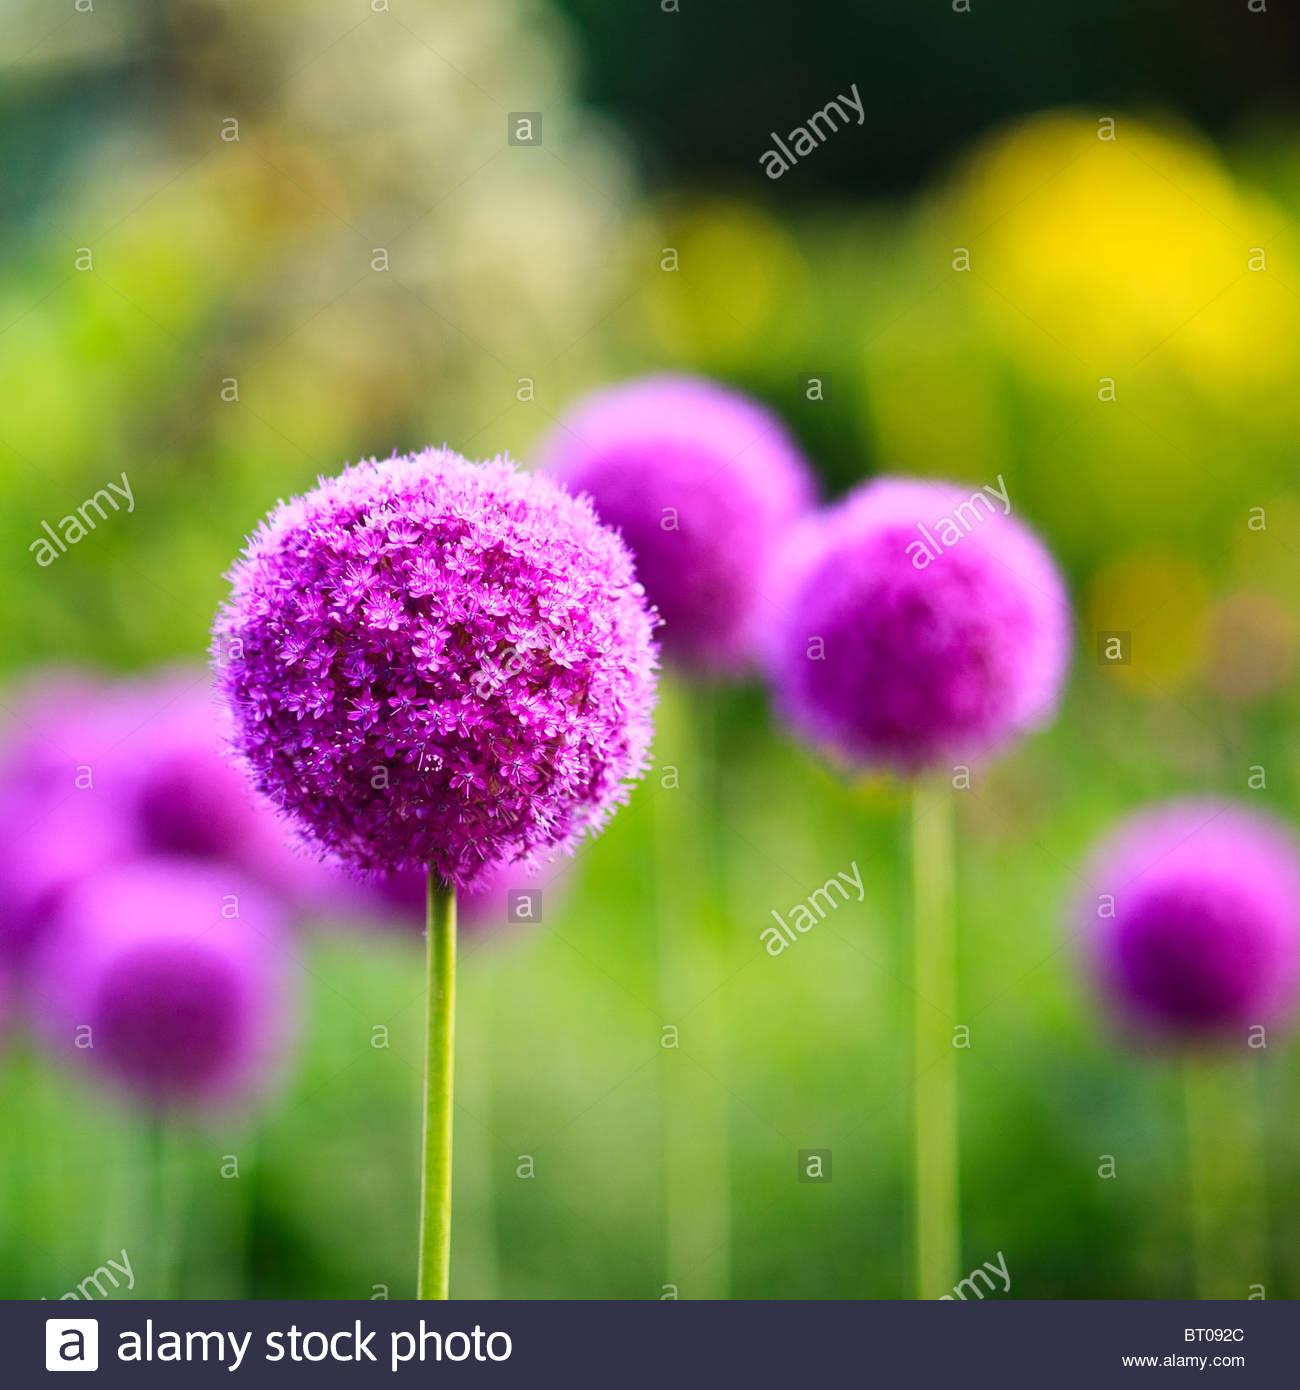 Purple Allium flowers, English Gardens, Assiniboine Park, Winnipeg, Manitoba, Canada. - Stock Image